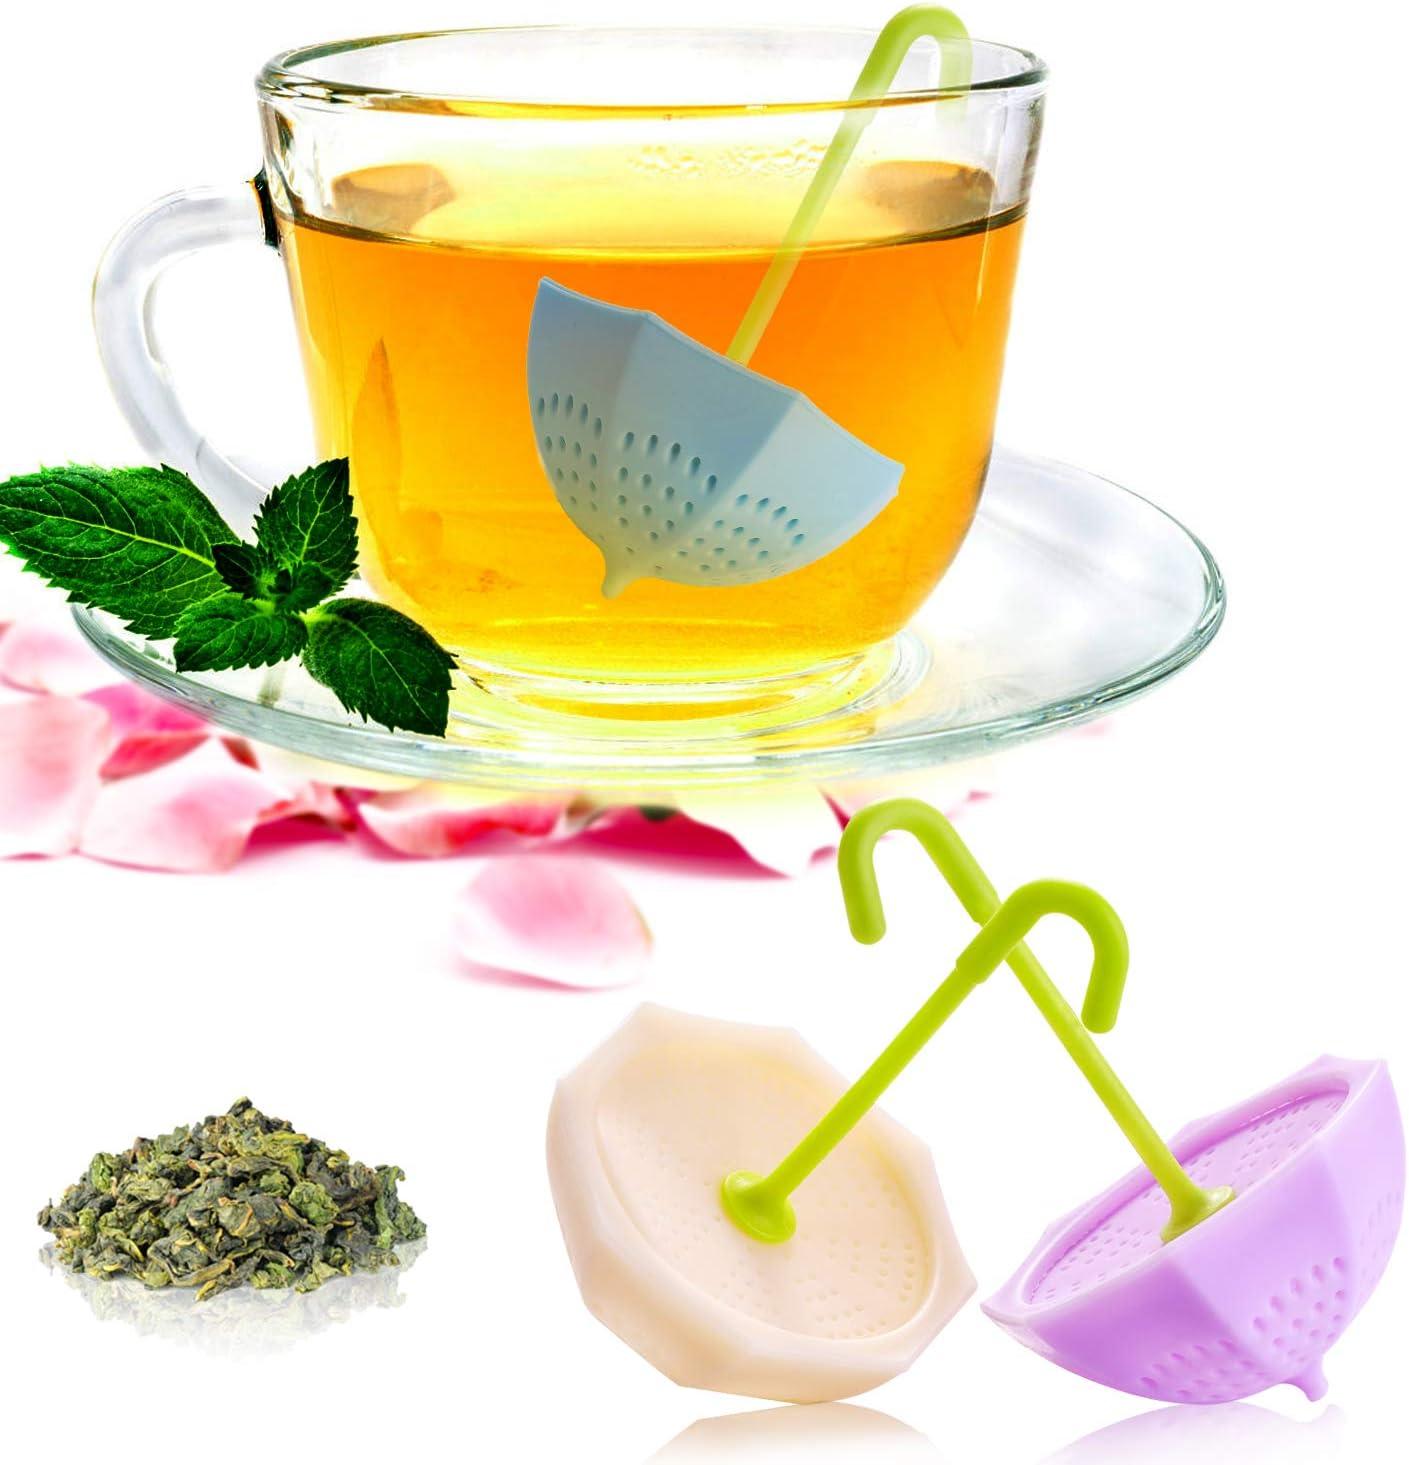 Loose Leaf Tea Infuser -Senbowe 3 Pack Reusable Silicone Tea Infuser Strainer,Genuine Premium Loose Leaf Infuser/Tea Balls, Stainless Steel Strainer, for All Types of Loose Leaf Tea